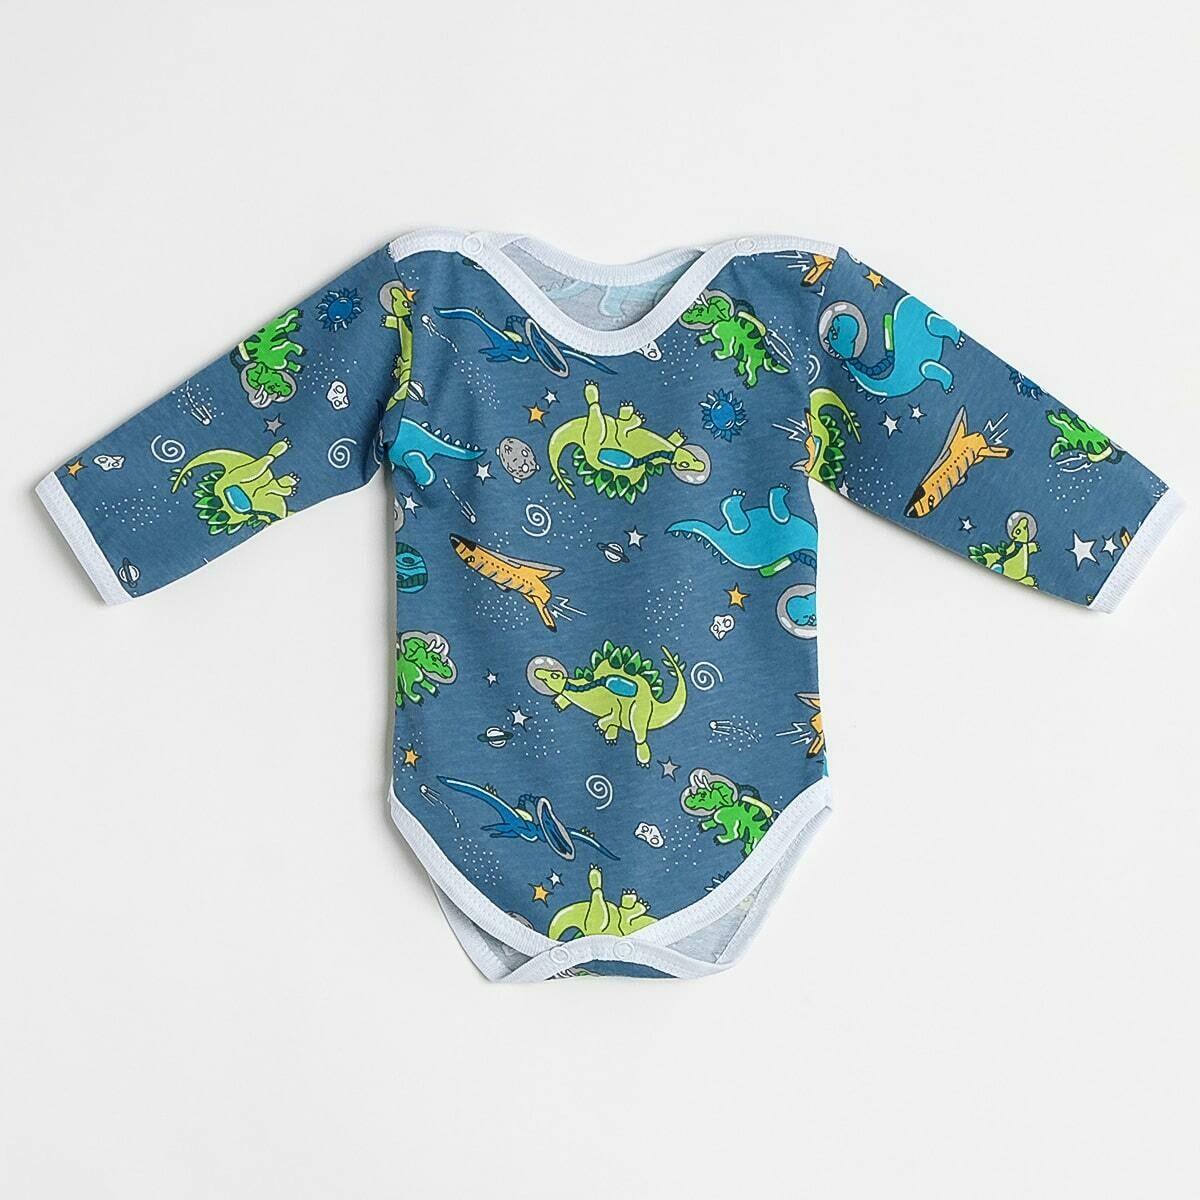 Боди Утёнок, тонкий трикотаж, динозавры, синий